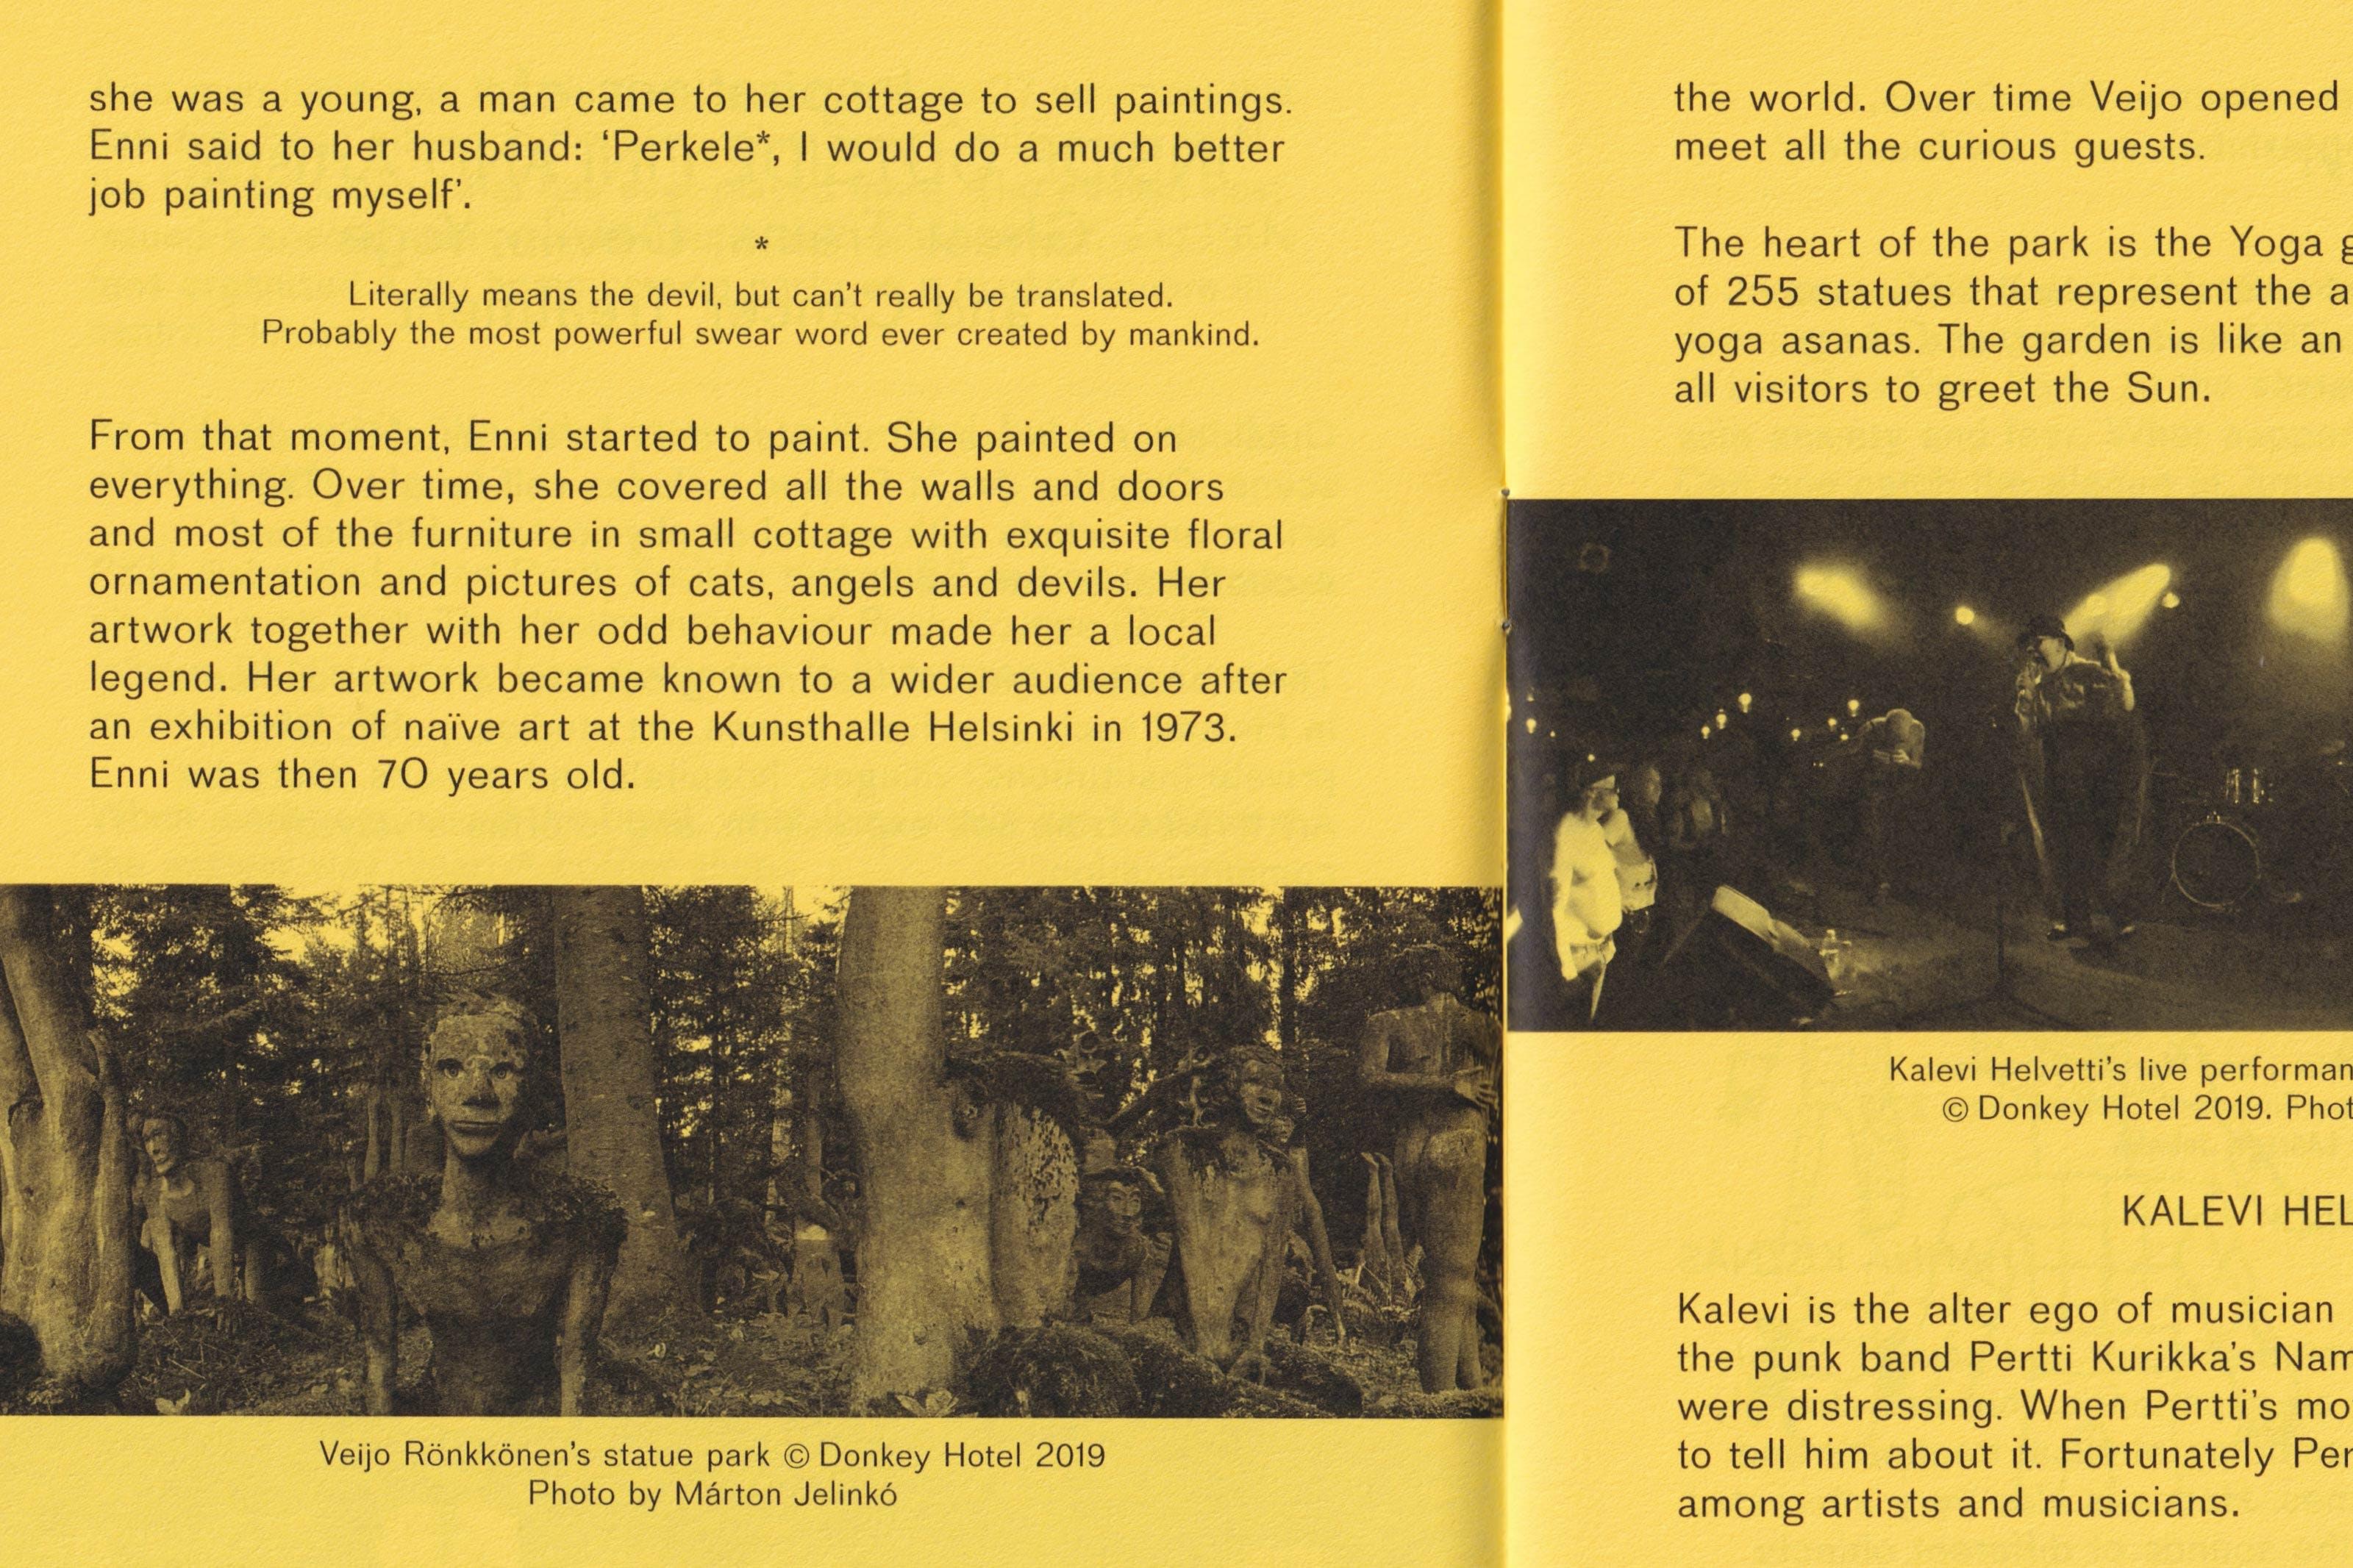 wolfe hall, finnish institute, finnish institute in london, Pertin Valinta, Pertti Kurikka's Name Day, punk, london plague, graphic design